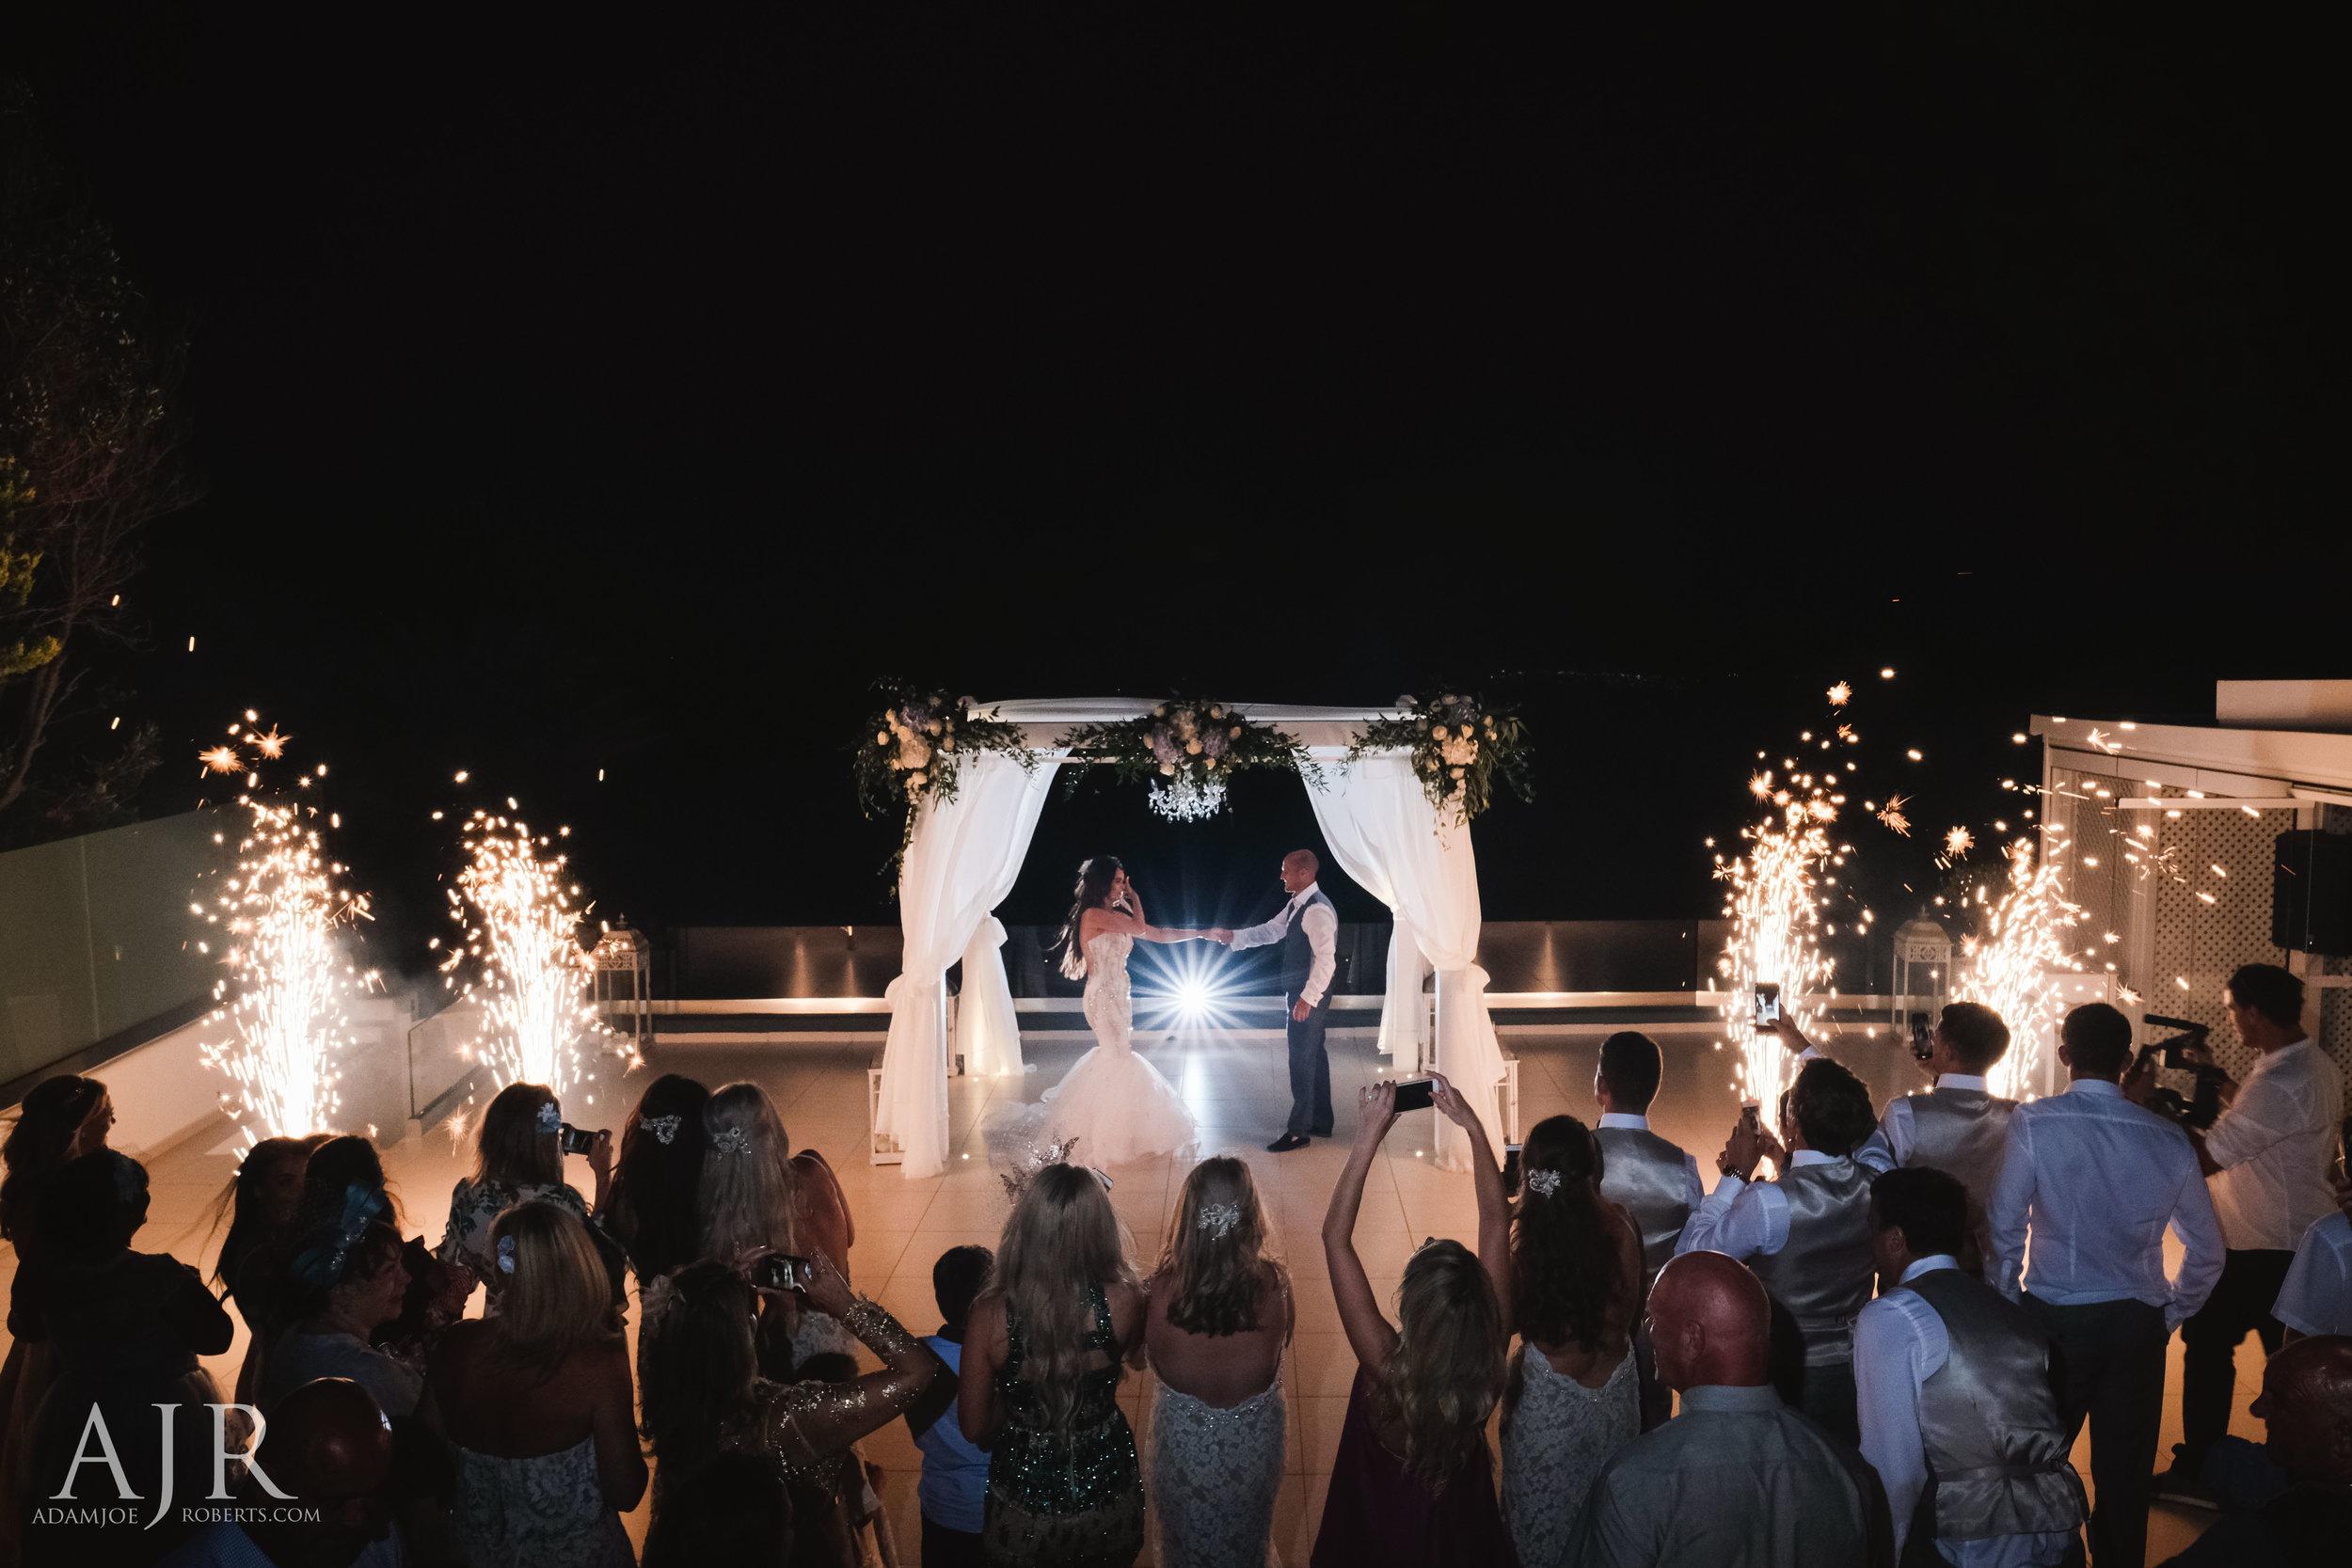 Mollie and Antony Le Ciel Santorini Destination Wedding - Sneak Peek (13 of 15).jpg